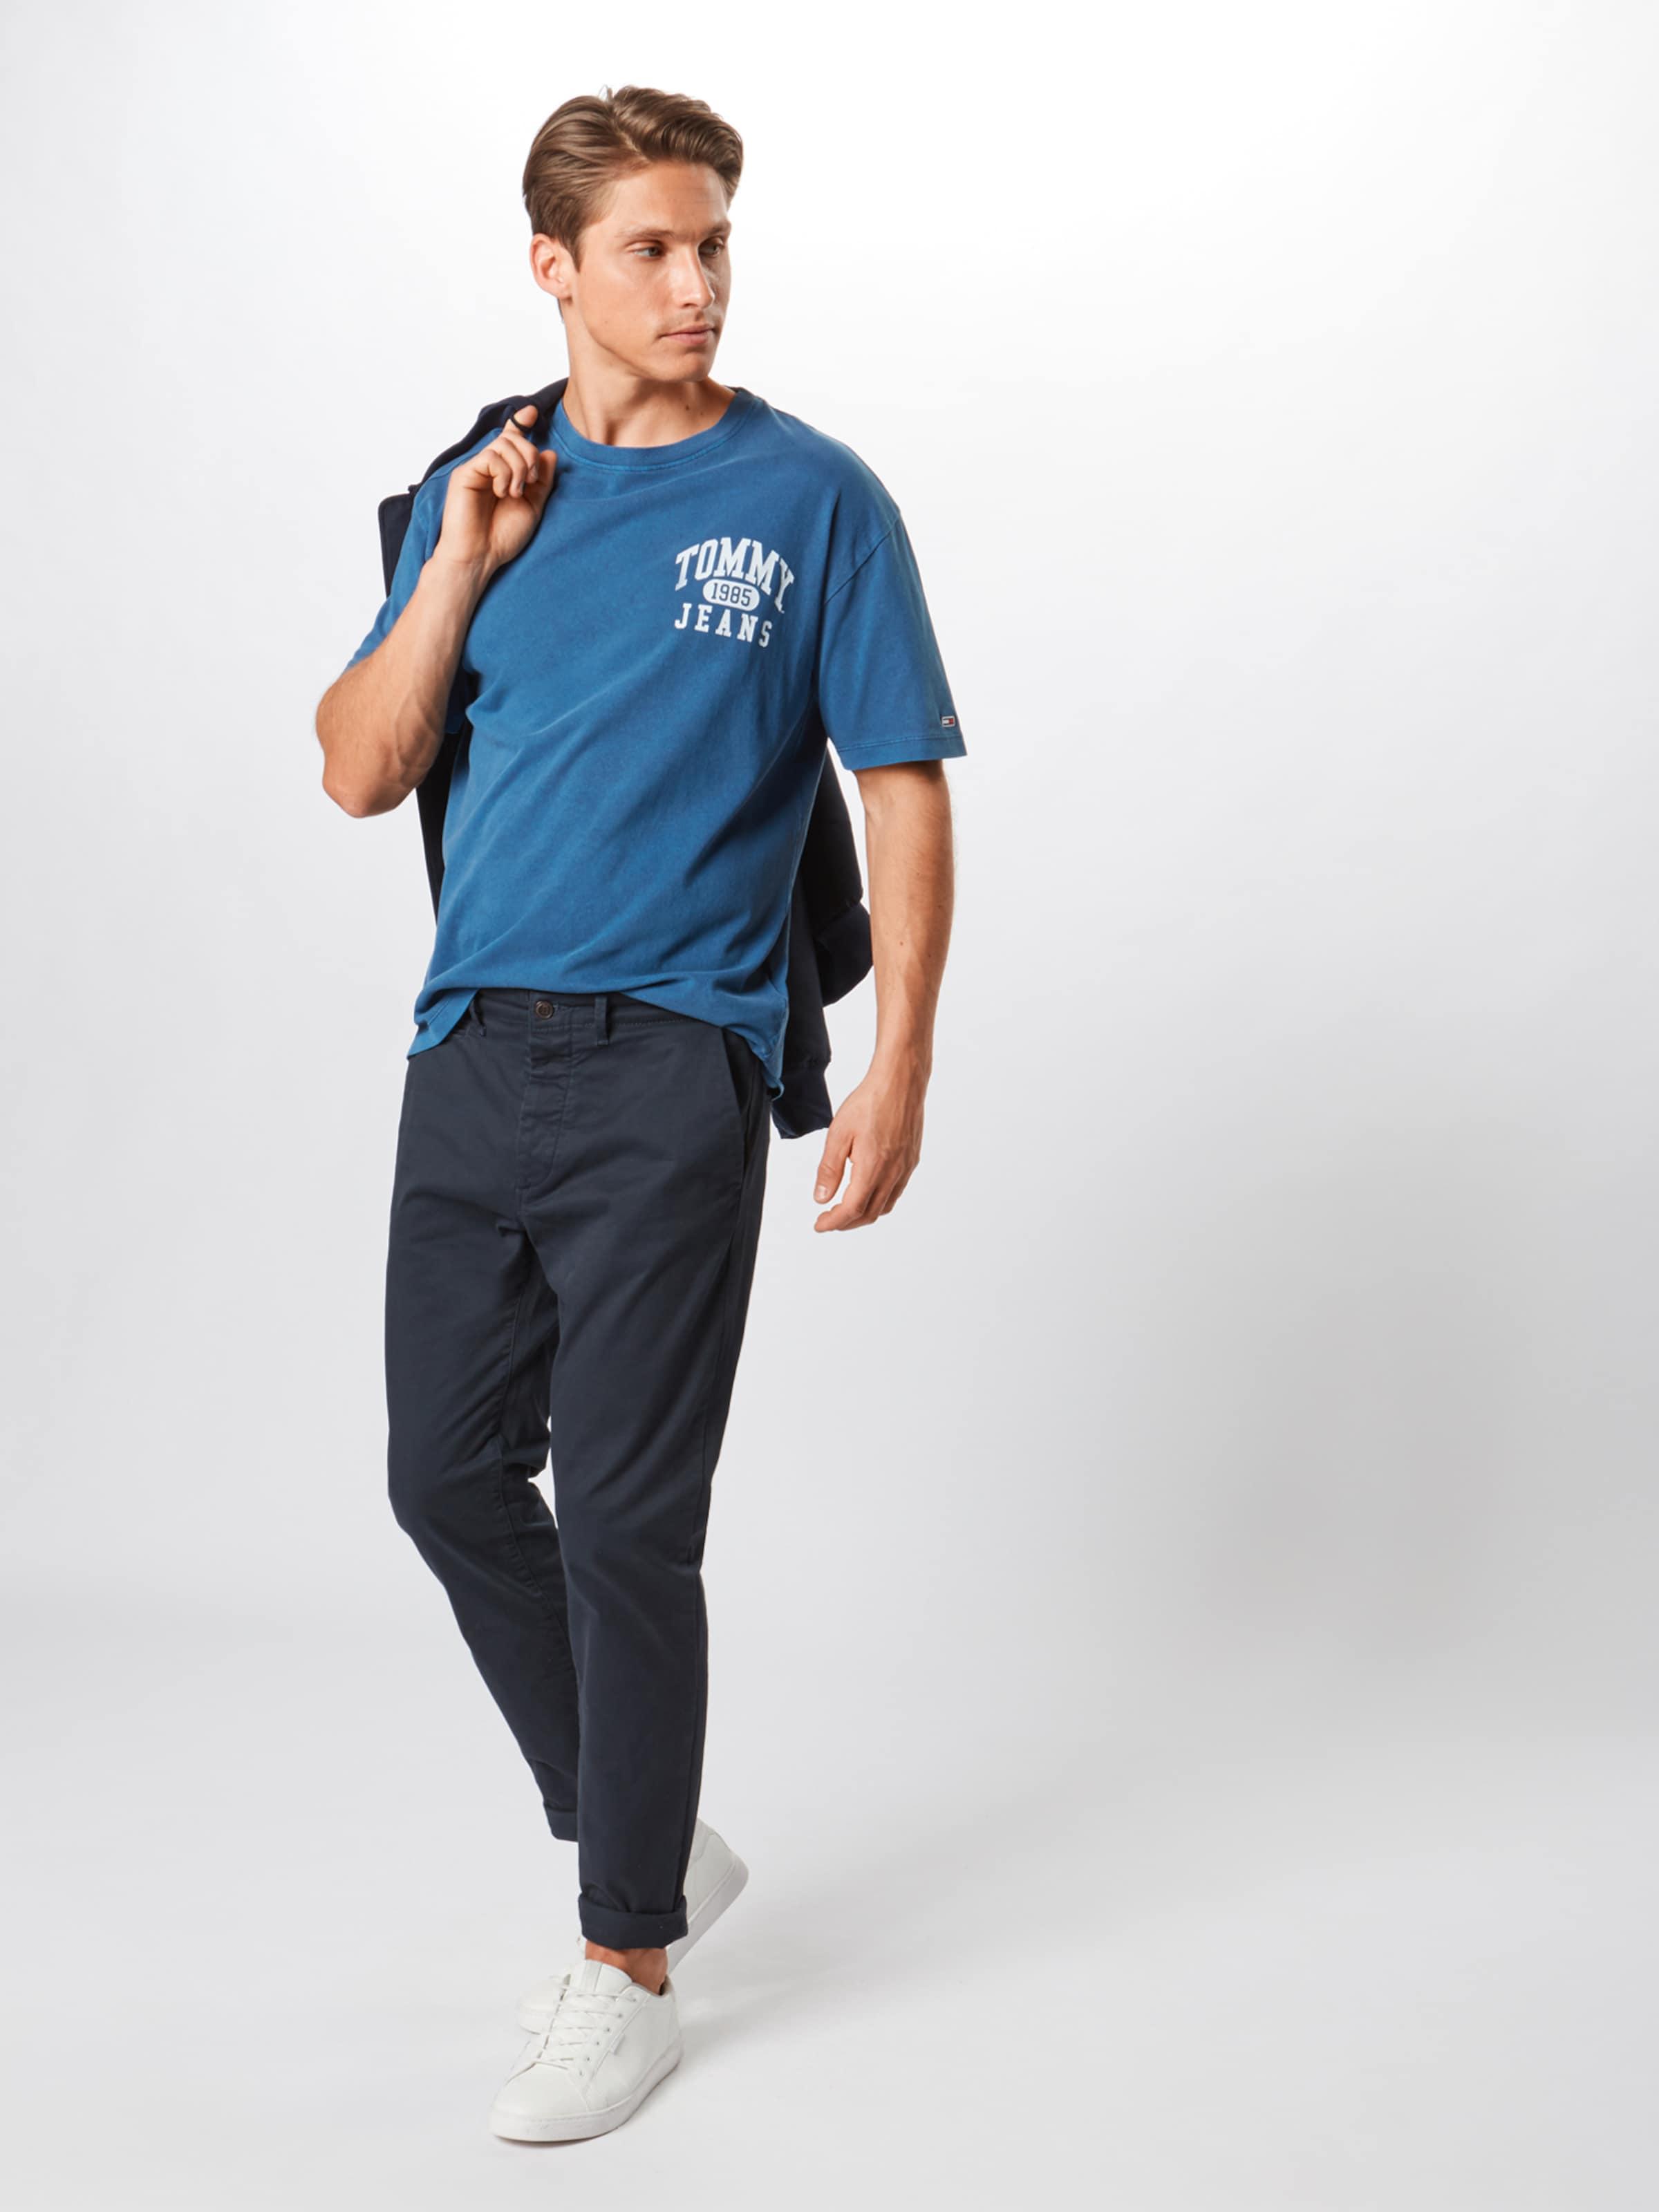 Tommy Shirt Jeans Graphic' DunkelblauWeiß 'washed In TJK15lFc3u